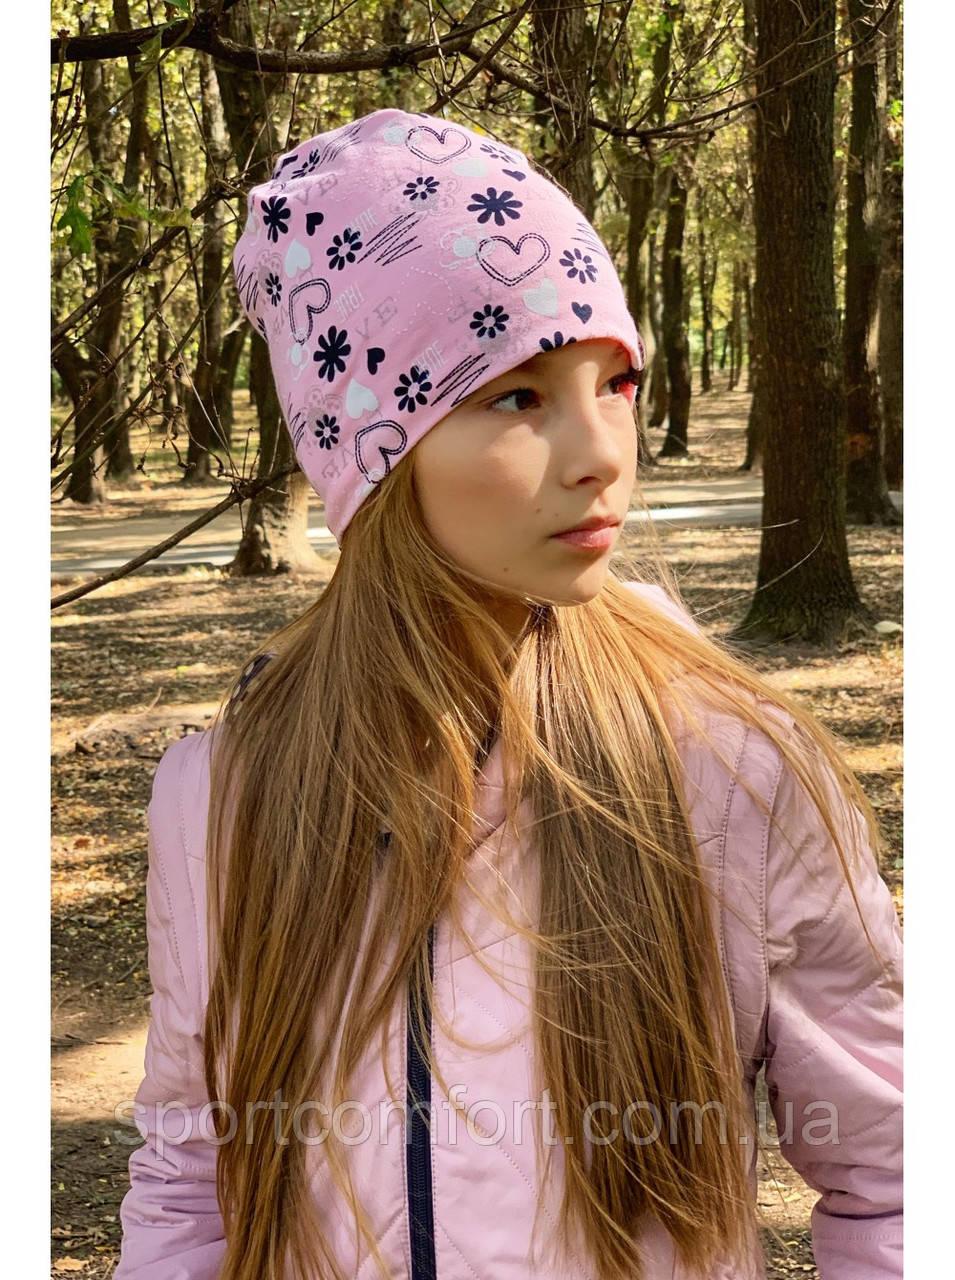 Шапка на девочку freever розовая